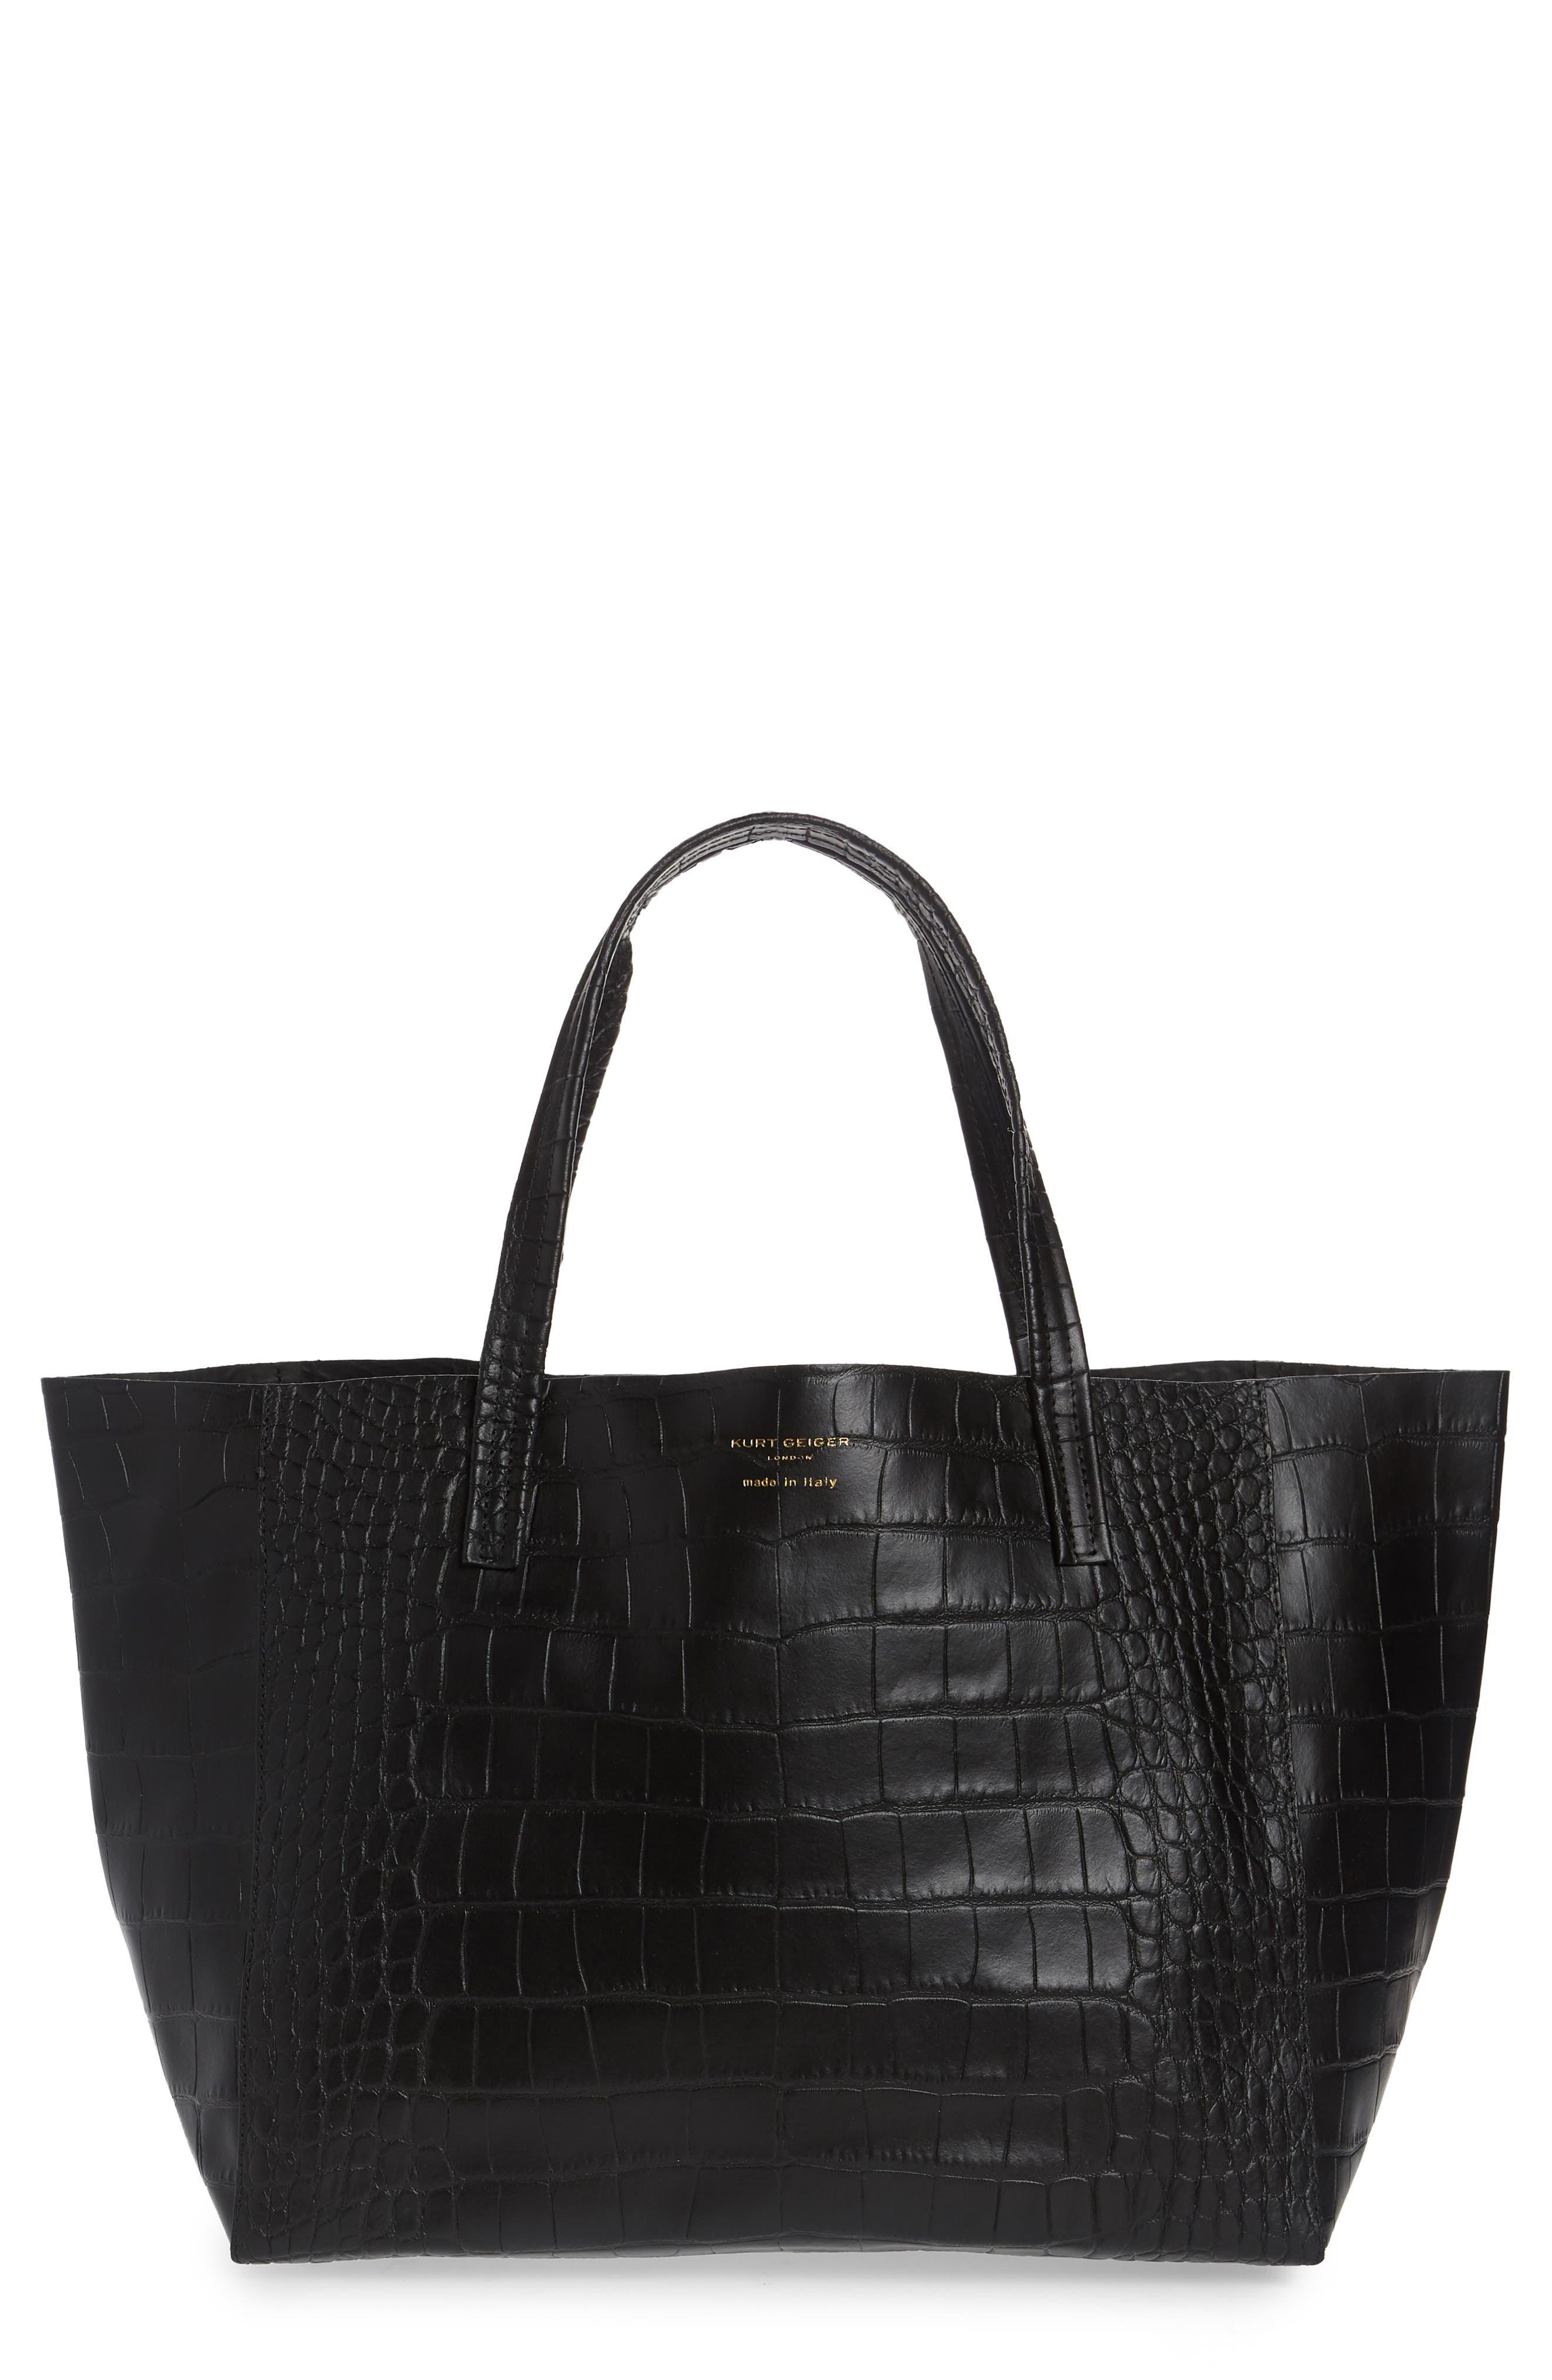 Kurt Geiger London Handbags, Purses